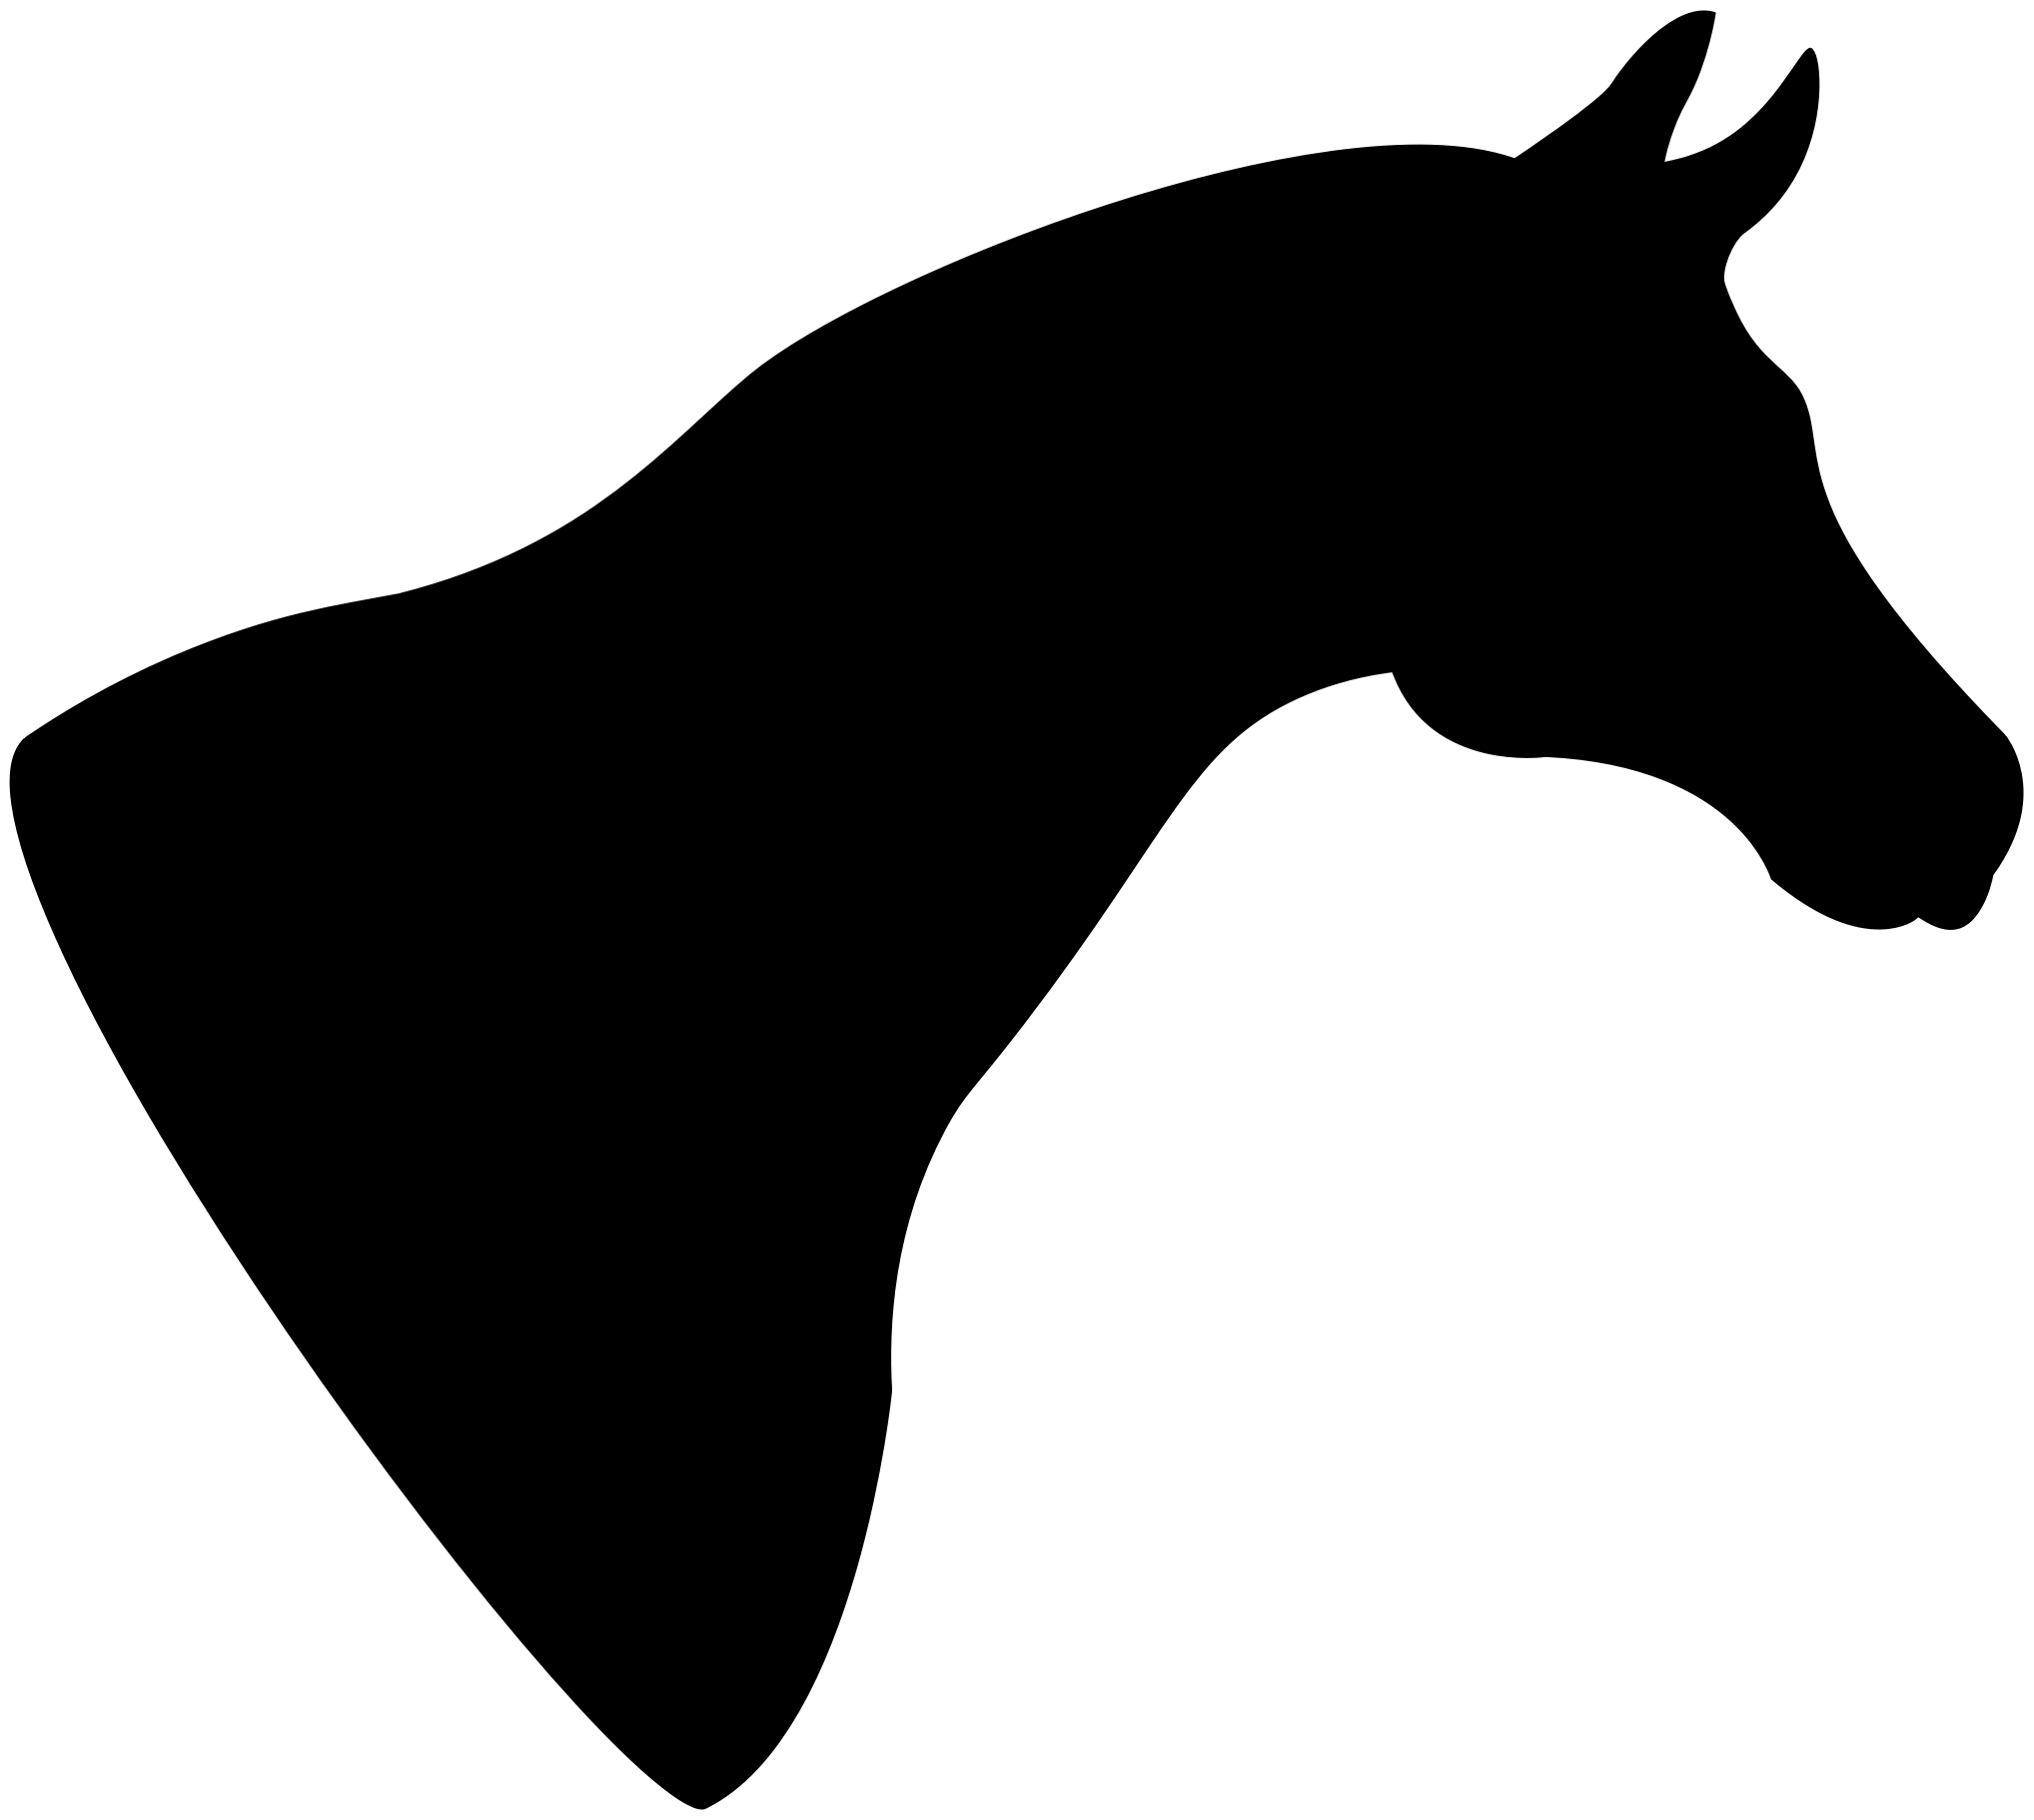 Clipart Horse Head Silhouette Horse Head Horses Silhouette